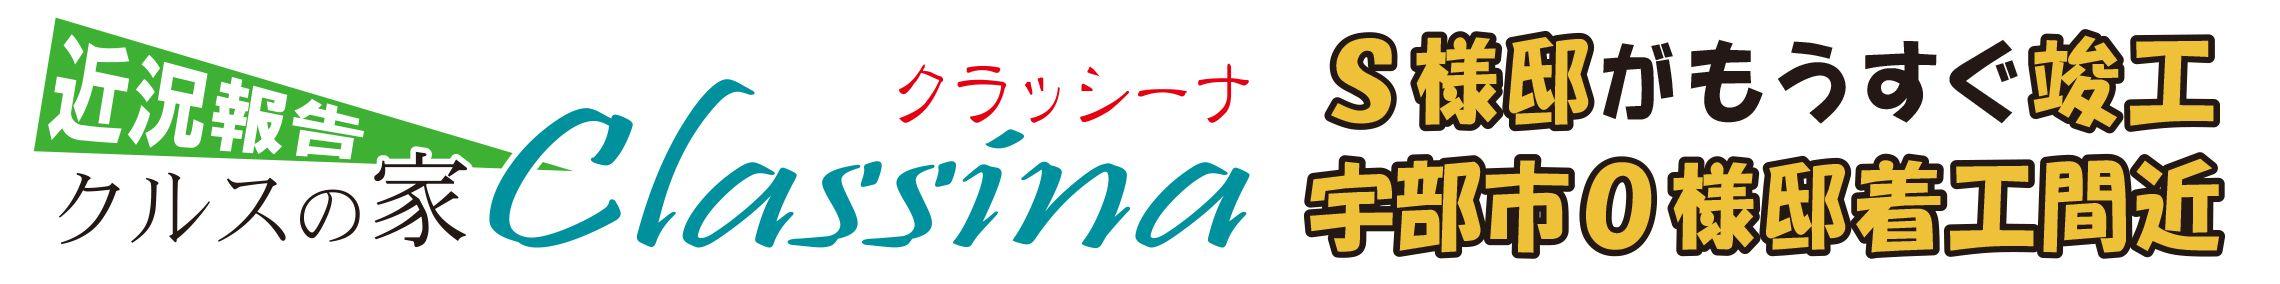 KuraSi-natu-sin100-02.jpg